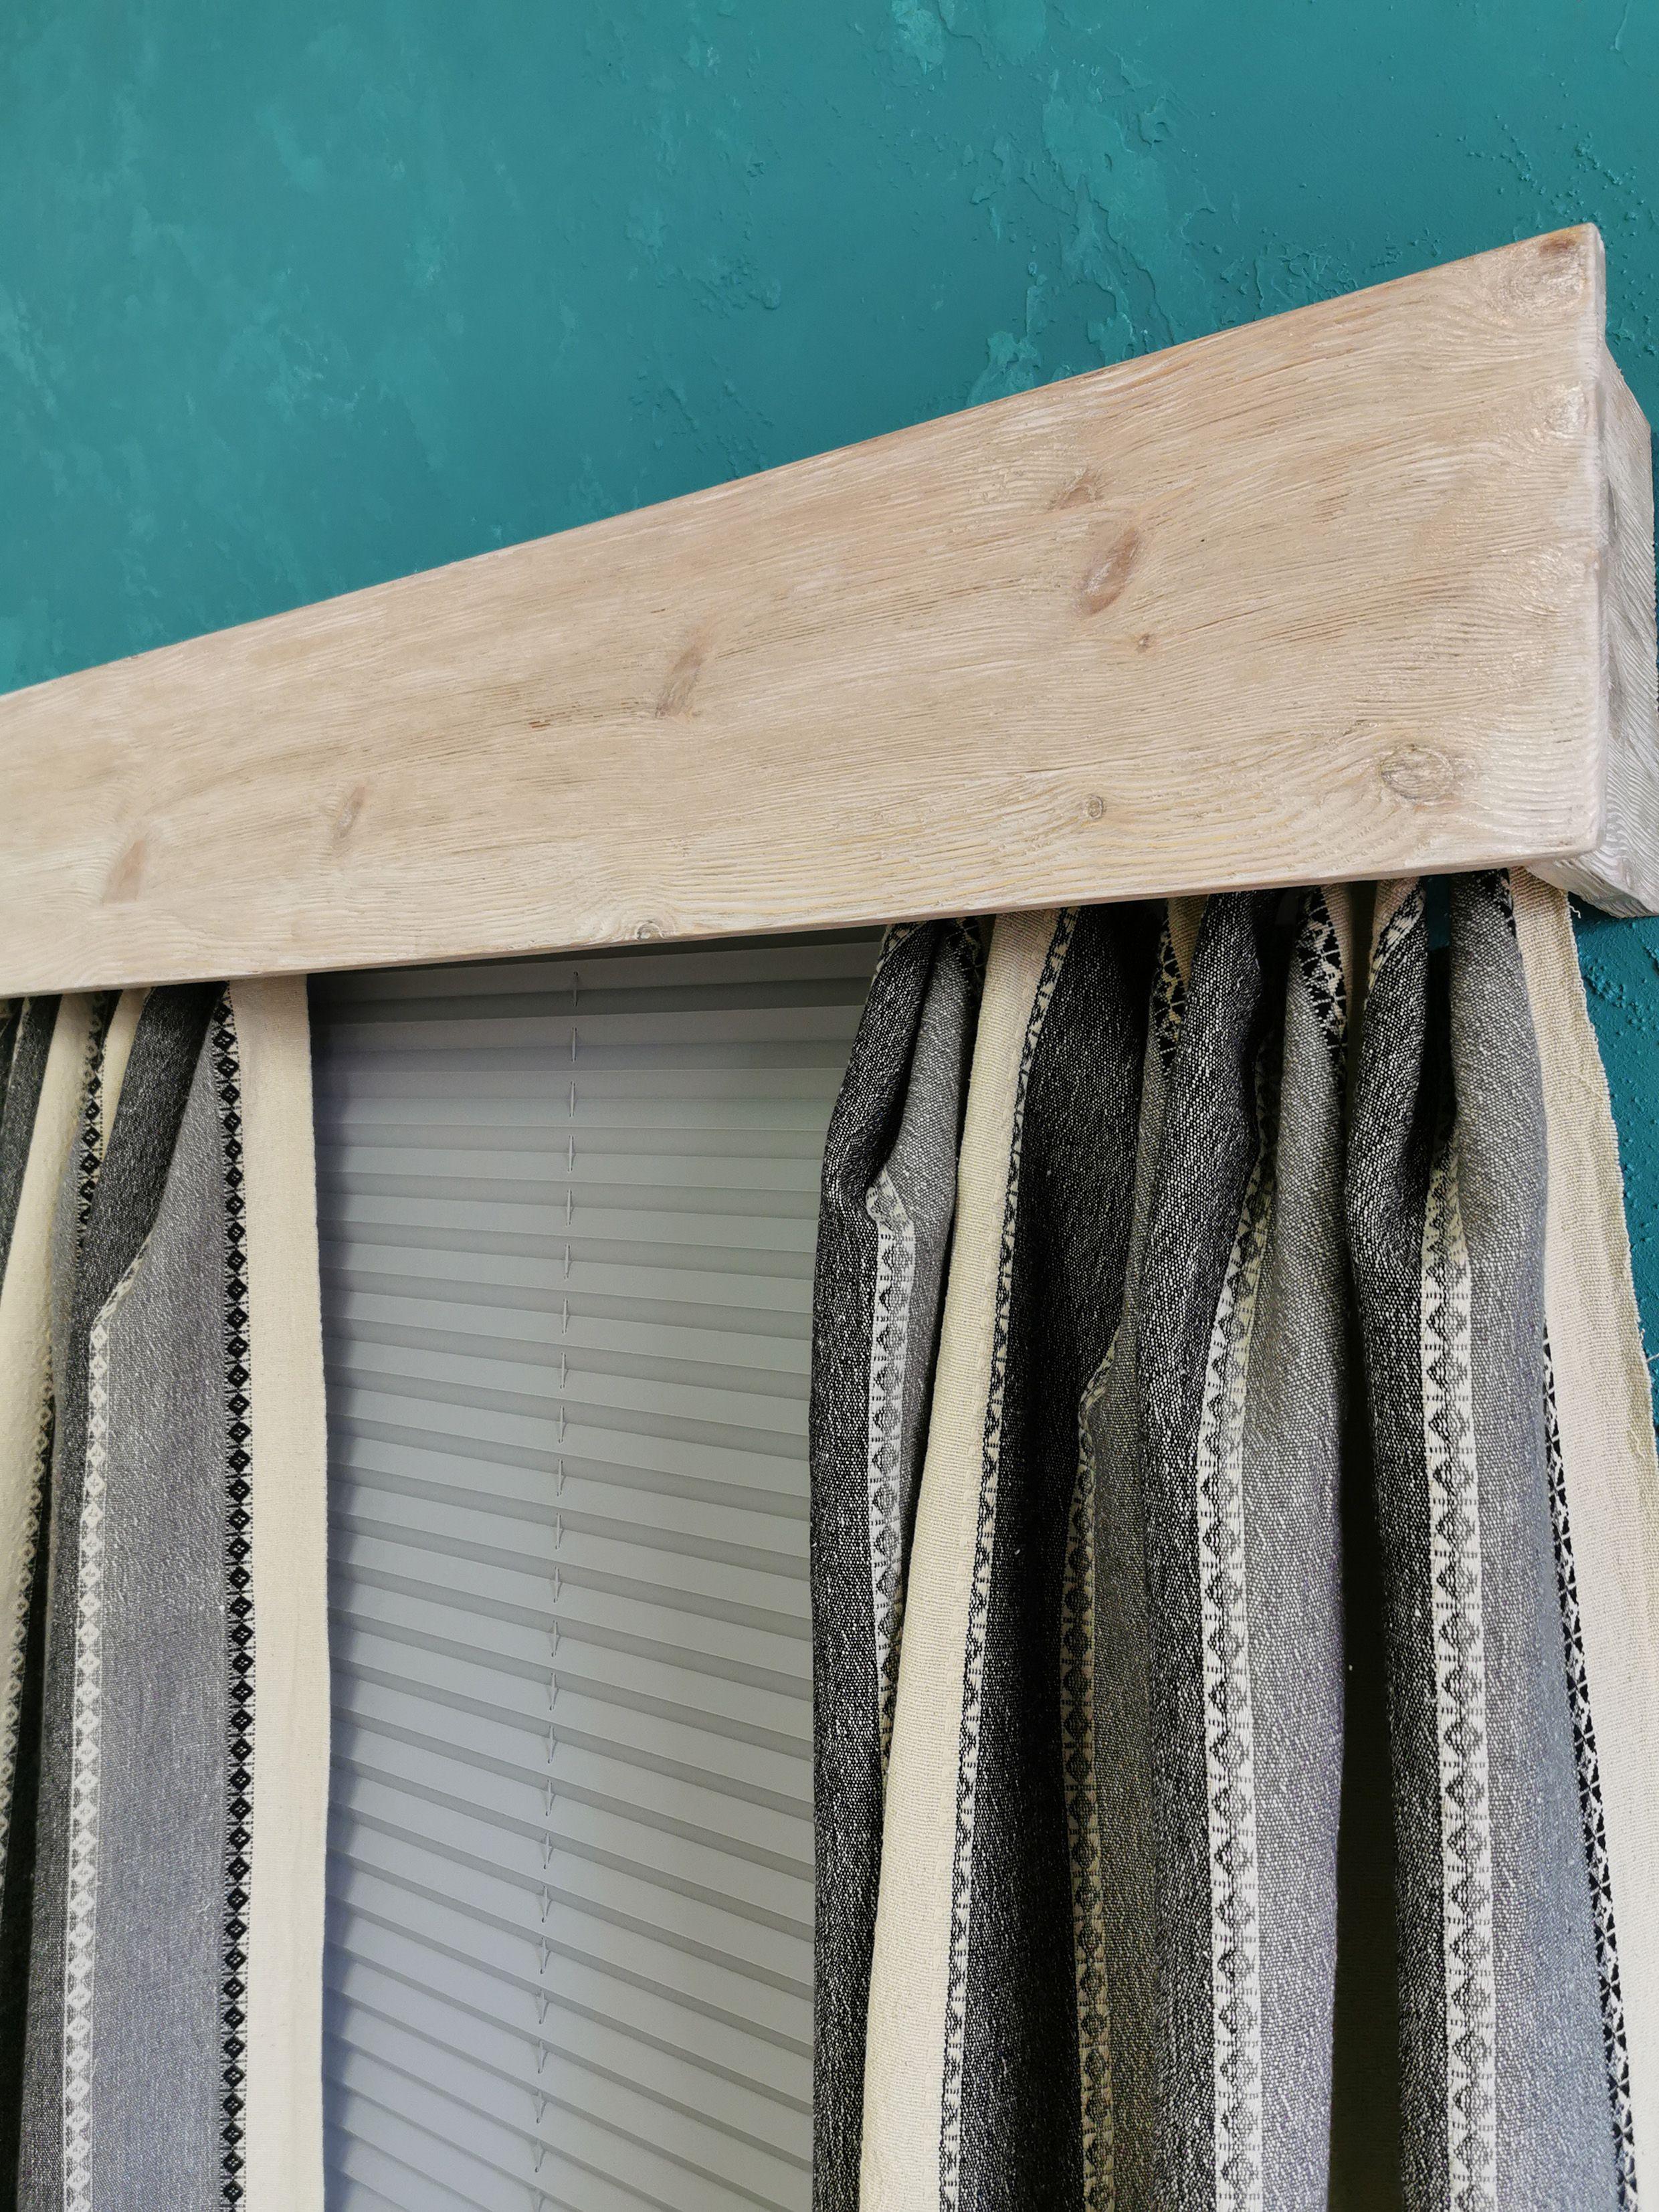 Window Valance Curtain Valance Wood Cornice Board Rustic Window